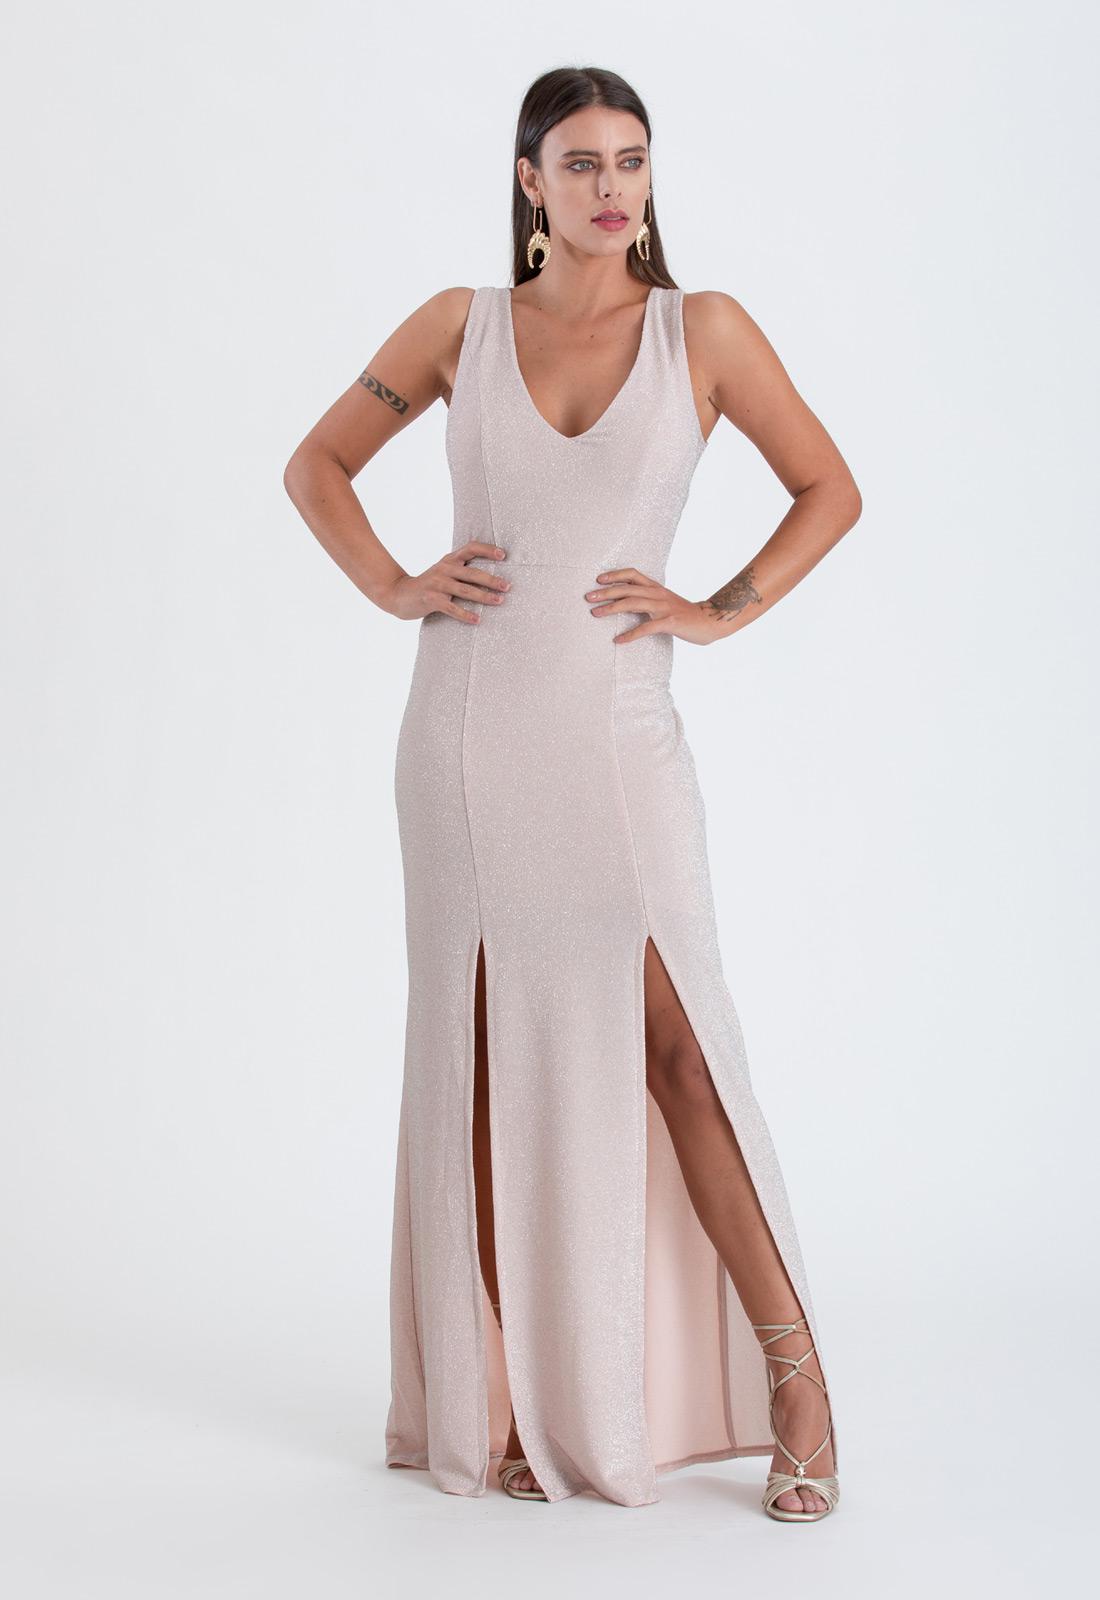 Vestido de festa lurex pérola - Ref. 2394